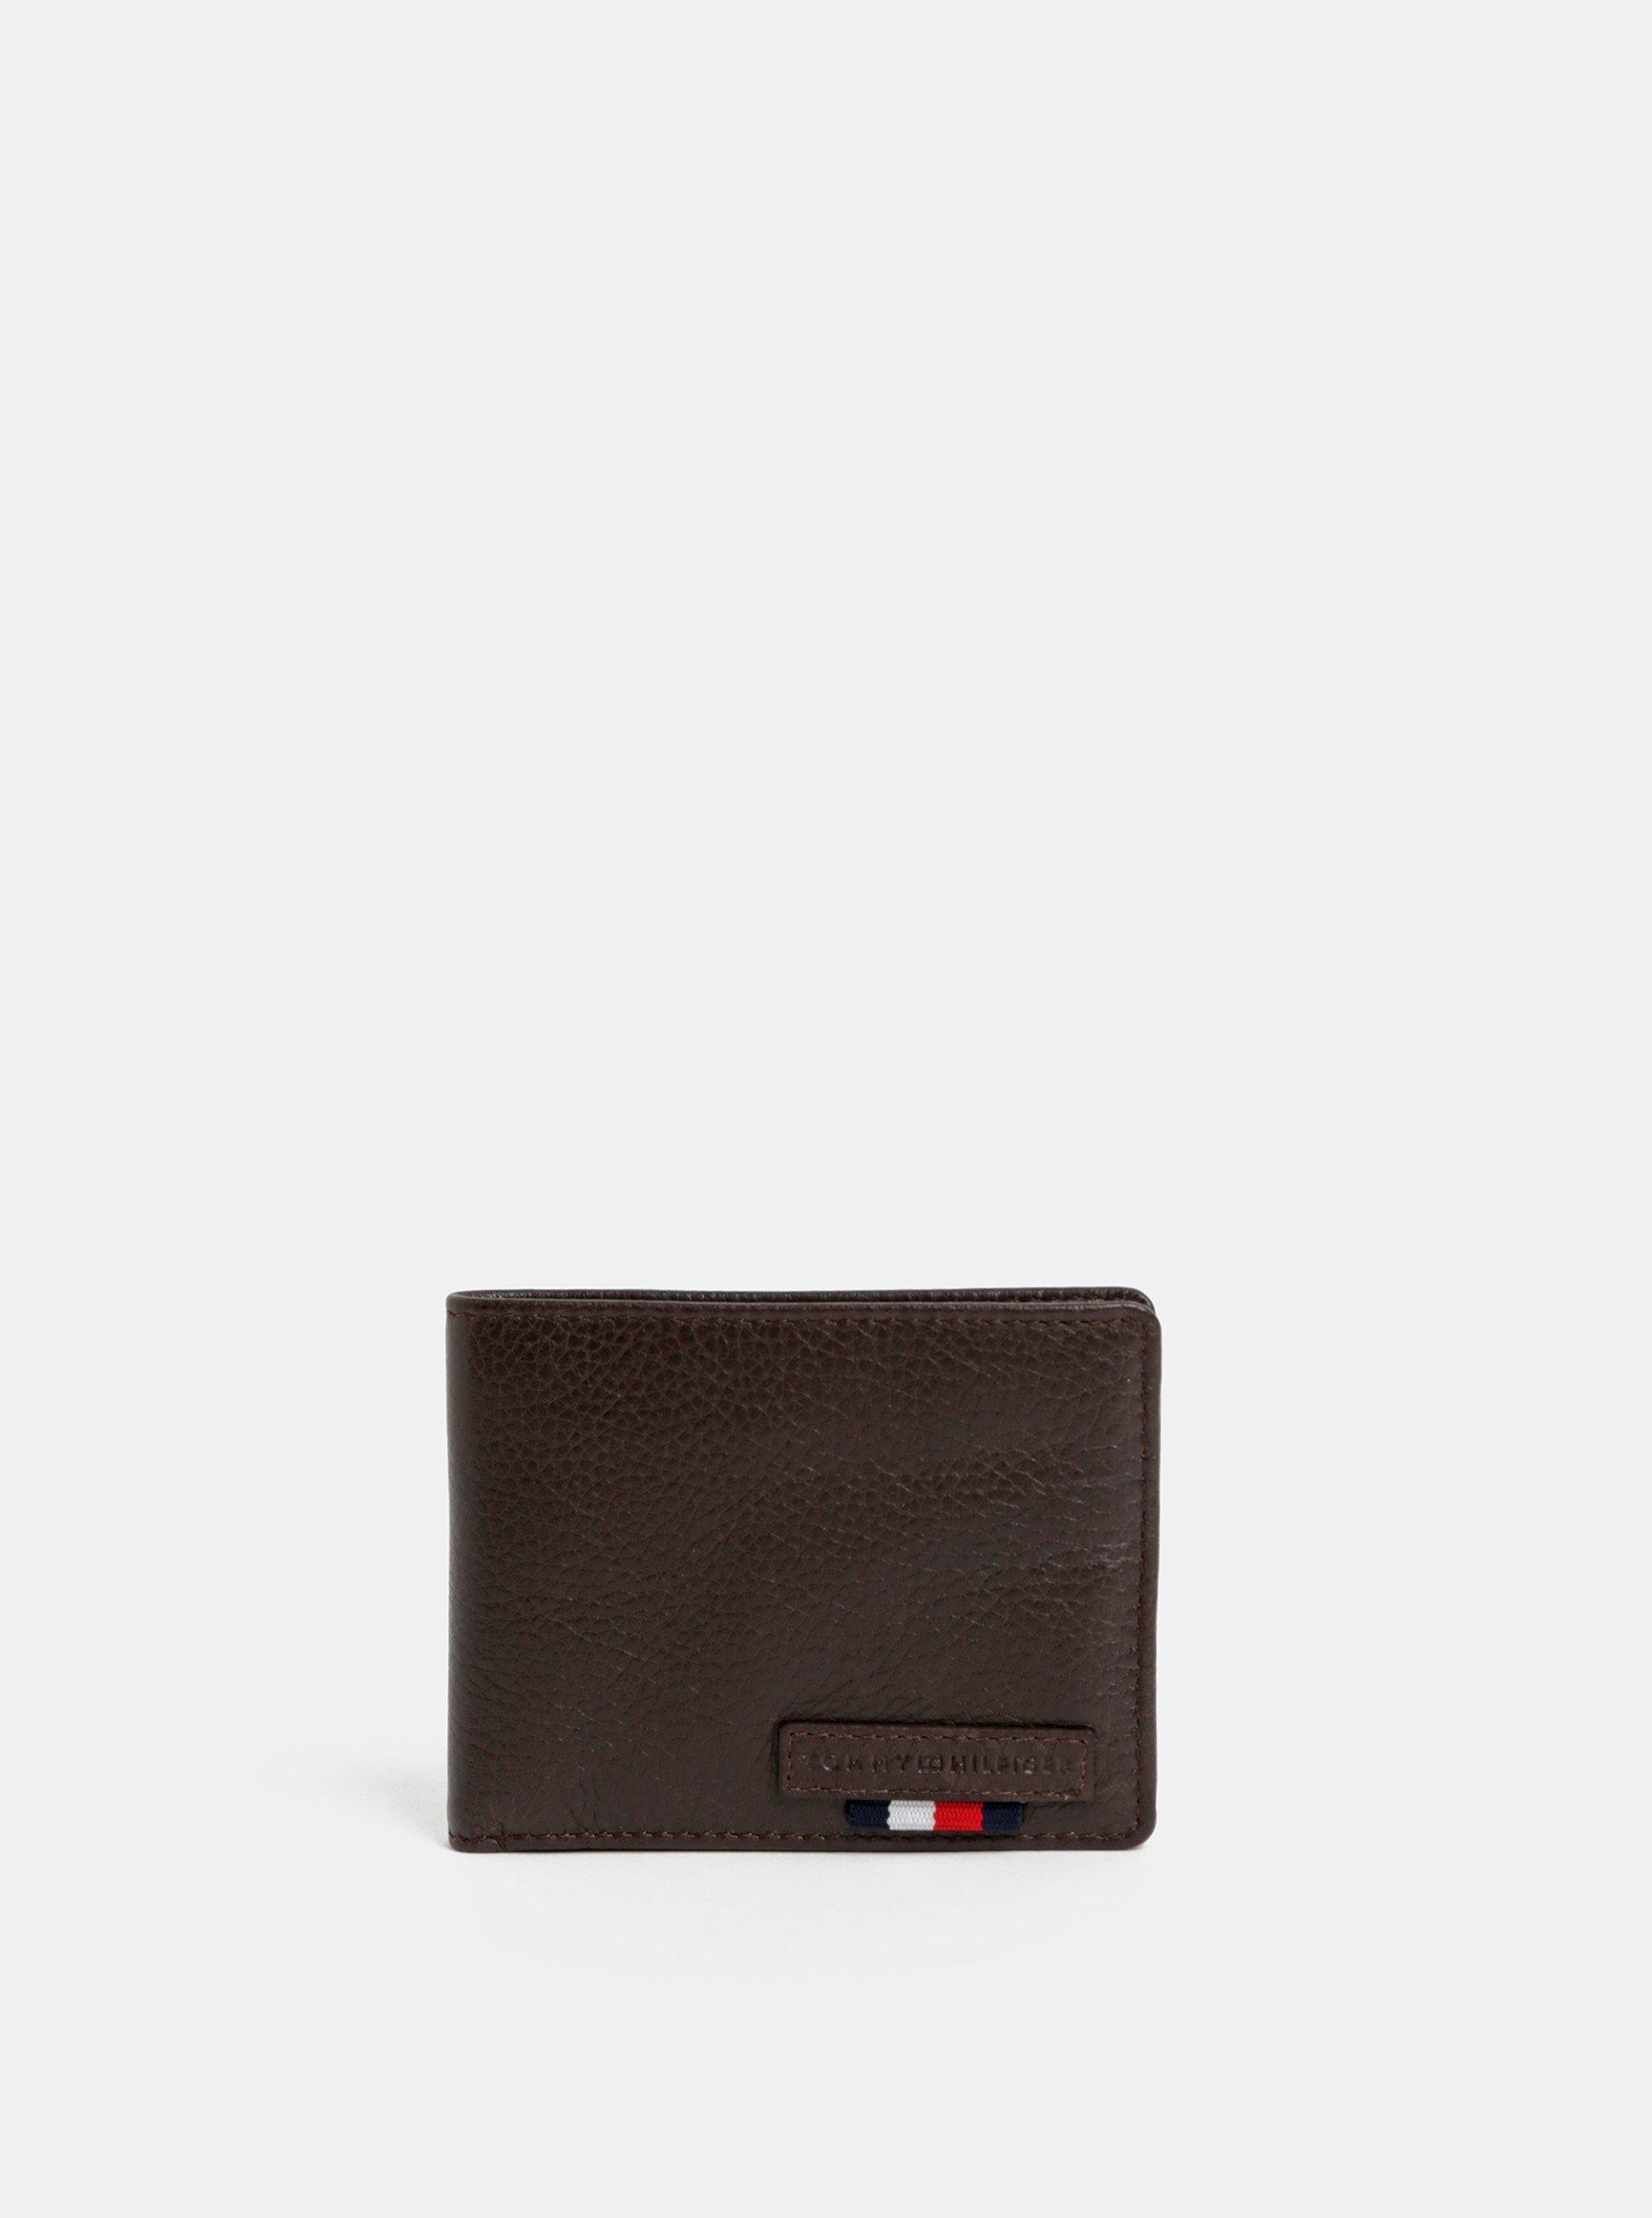 Hnedá kožená peňaženka Tommy Hilfiger ee49231fd50